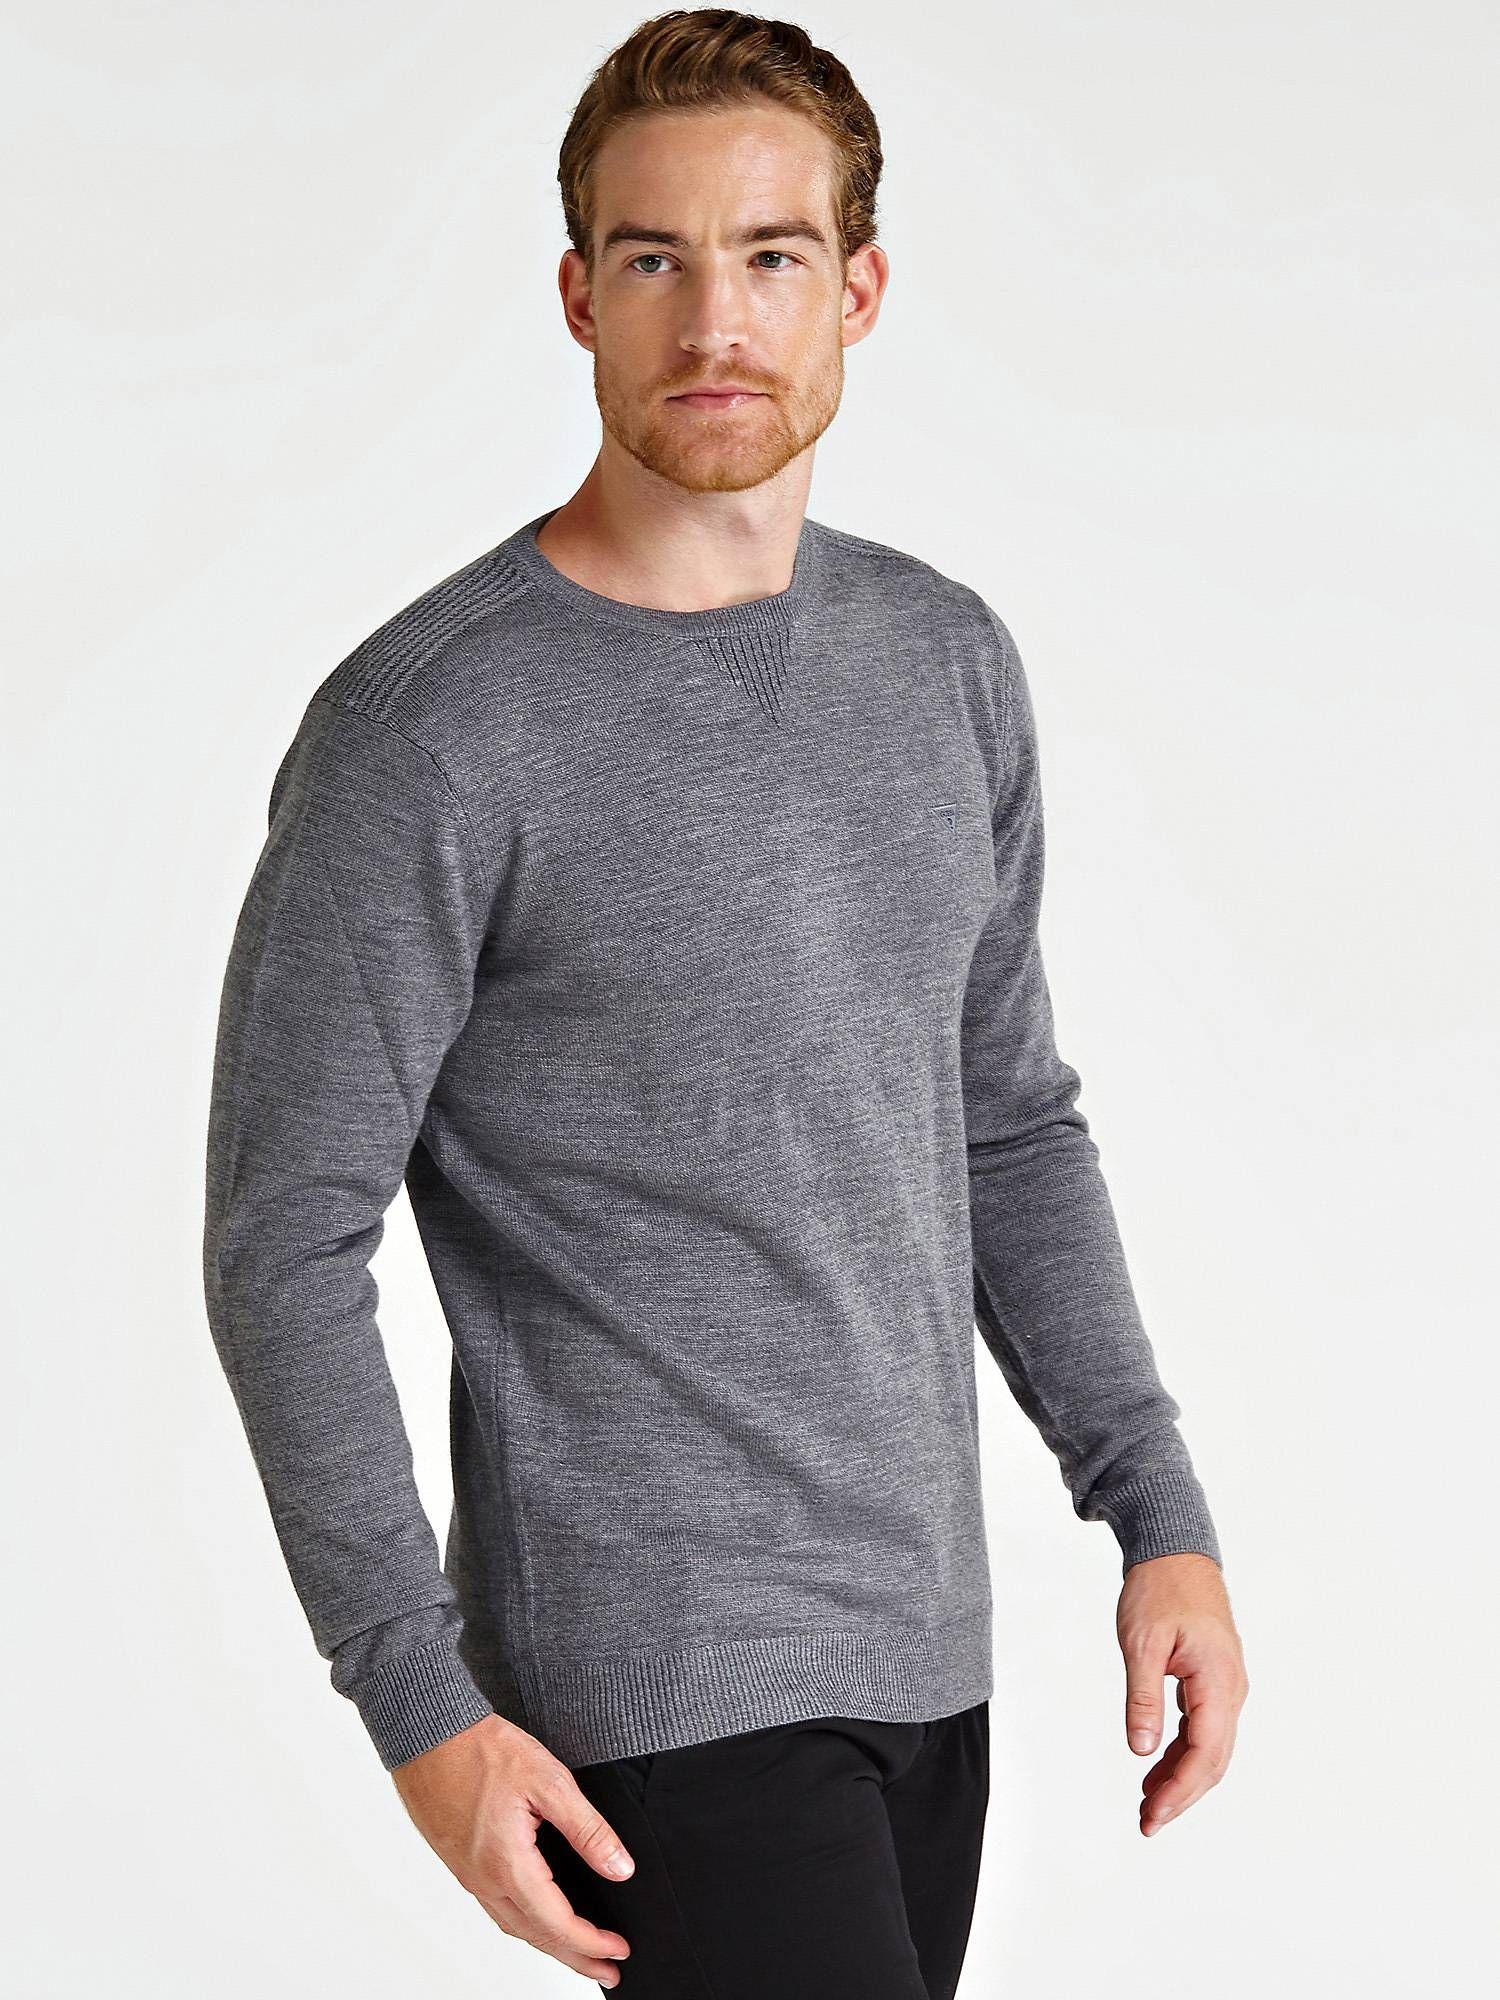 Guess Melissa Sweater Su/éter c/árdigan para Mujer